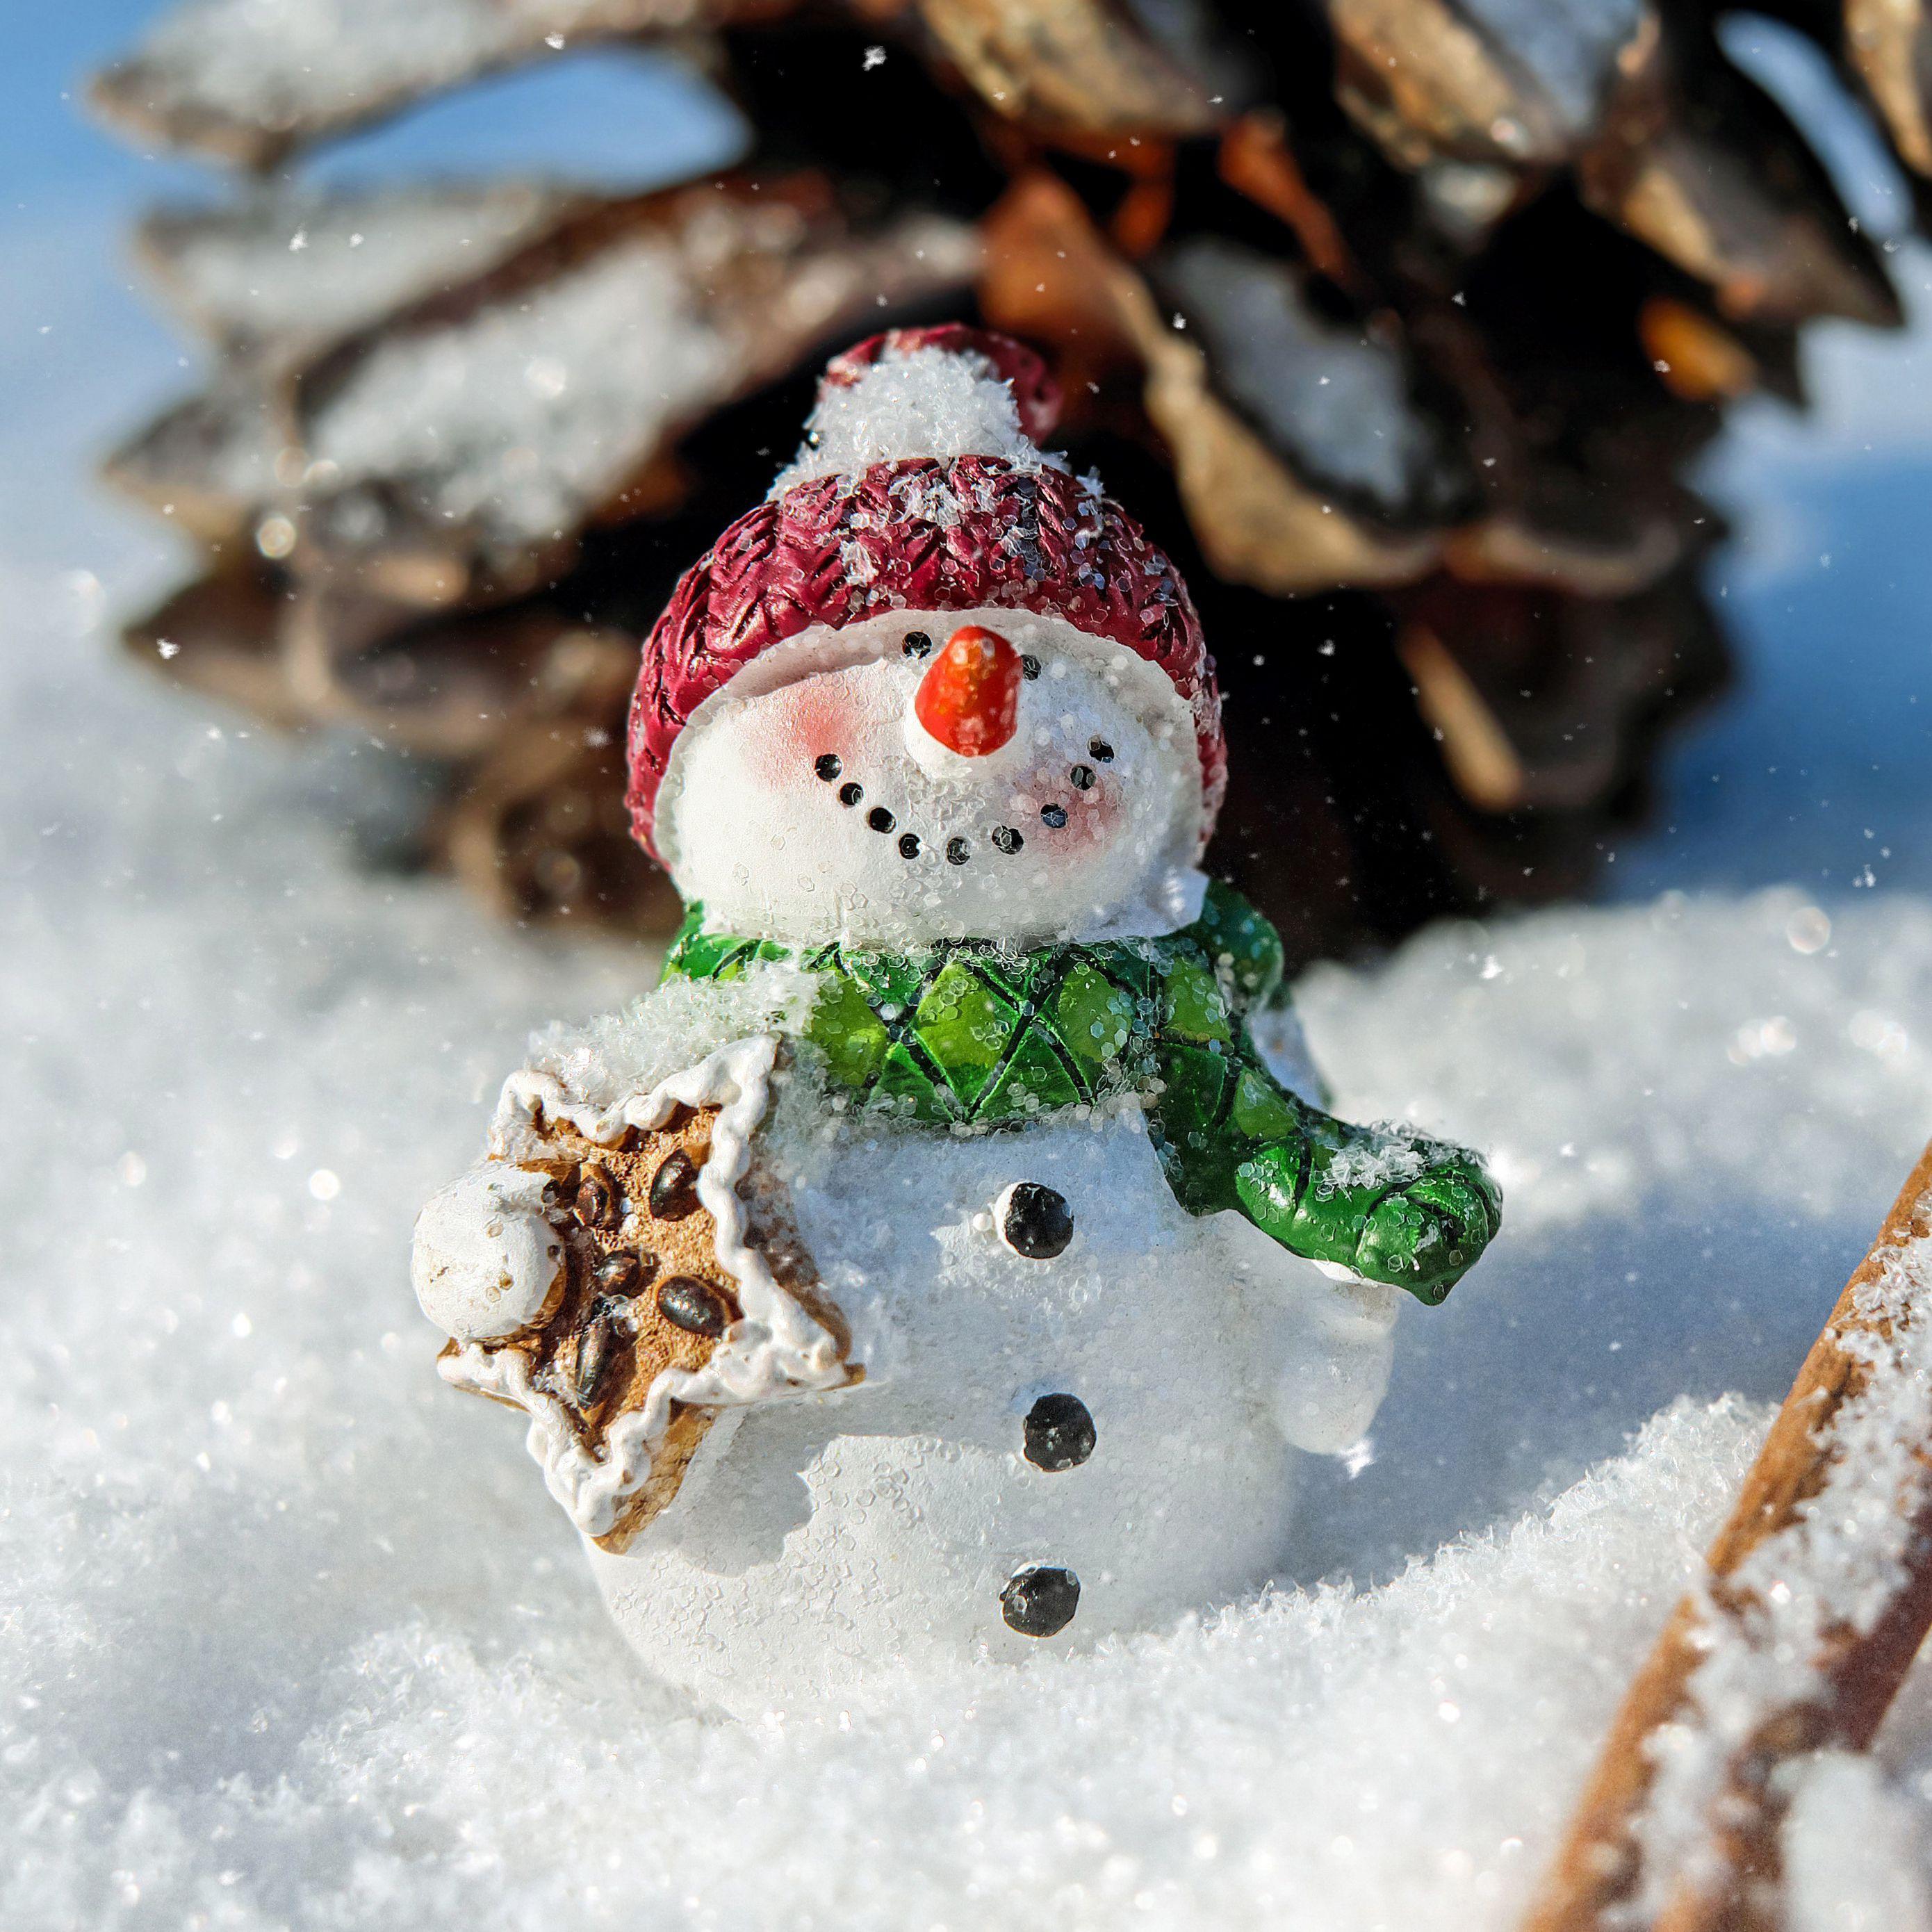 2780x2780 Wallpaper snowman, snow, cinnamon, pine cone, christmas, new year